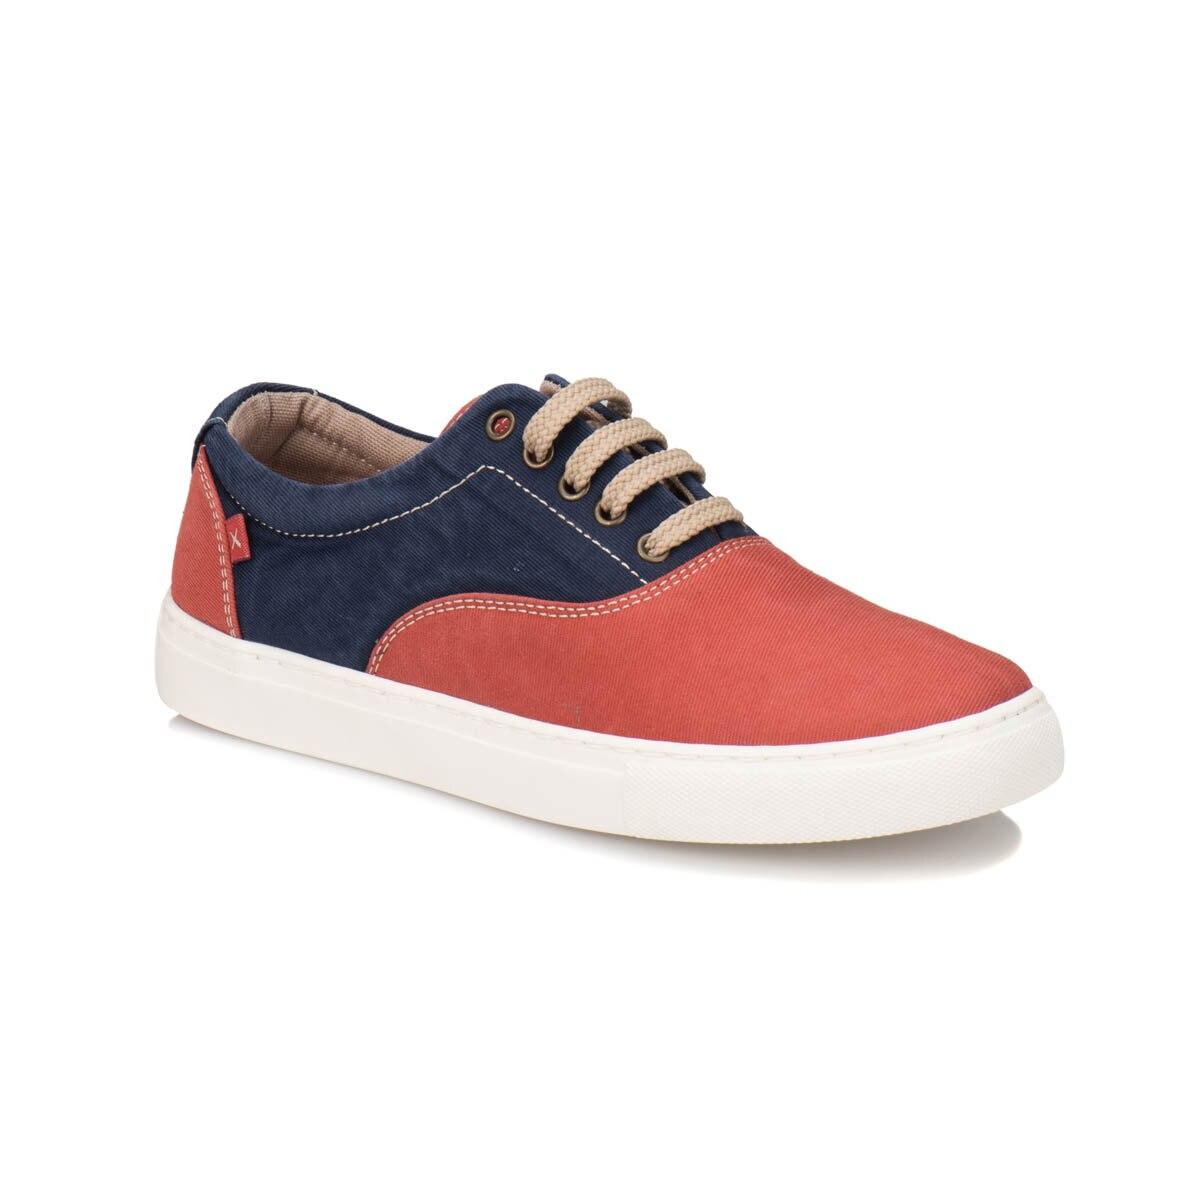 FLO ASTON G Burgundy Men 'S Shoes KINETIX